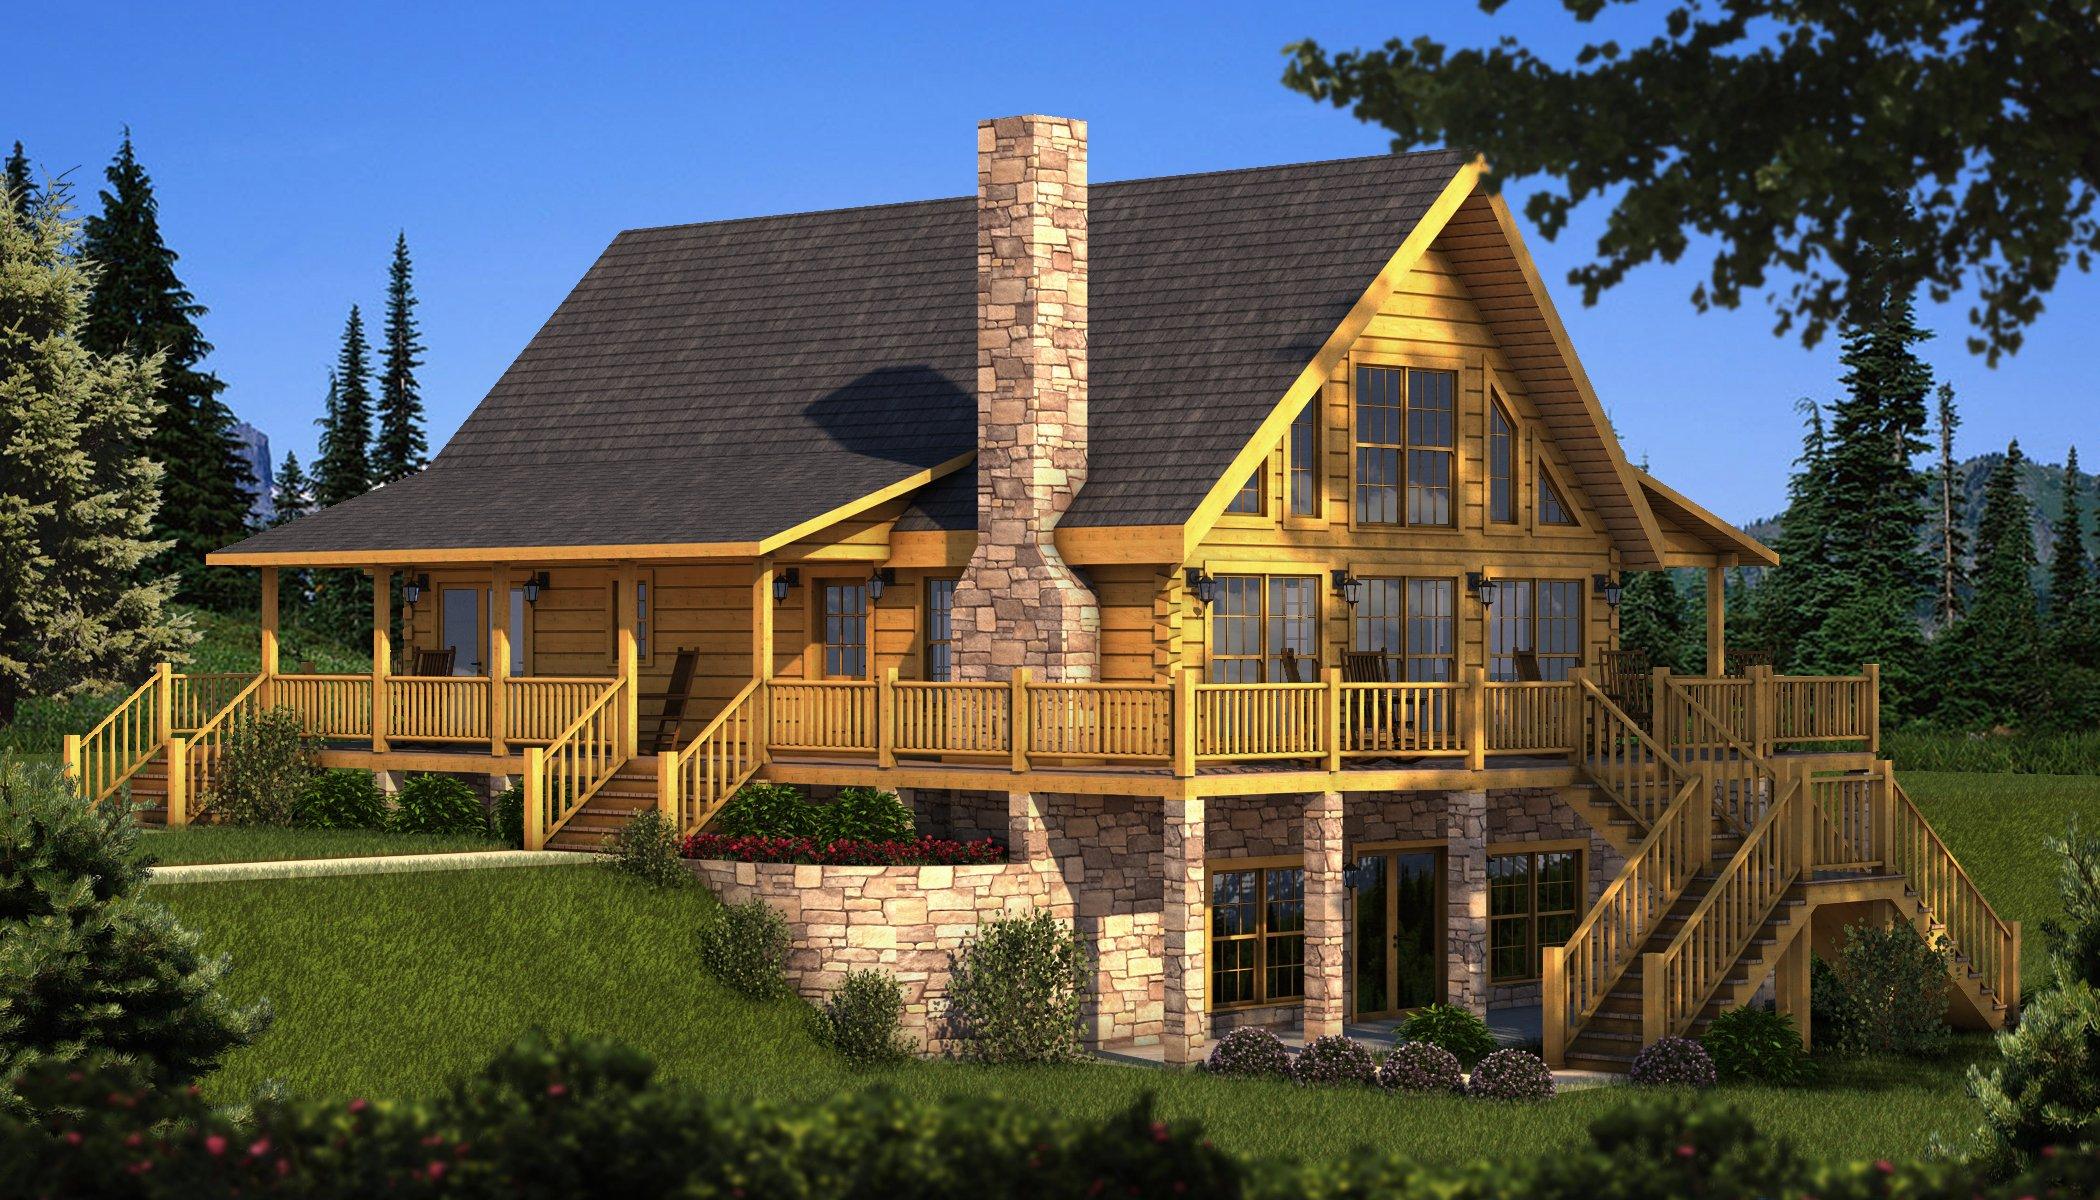 Berkshire plans information southland log homes for Log cabin house plans free